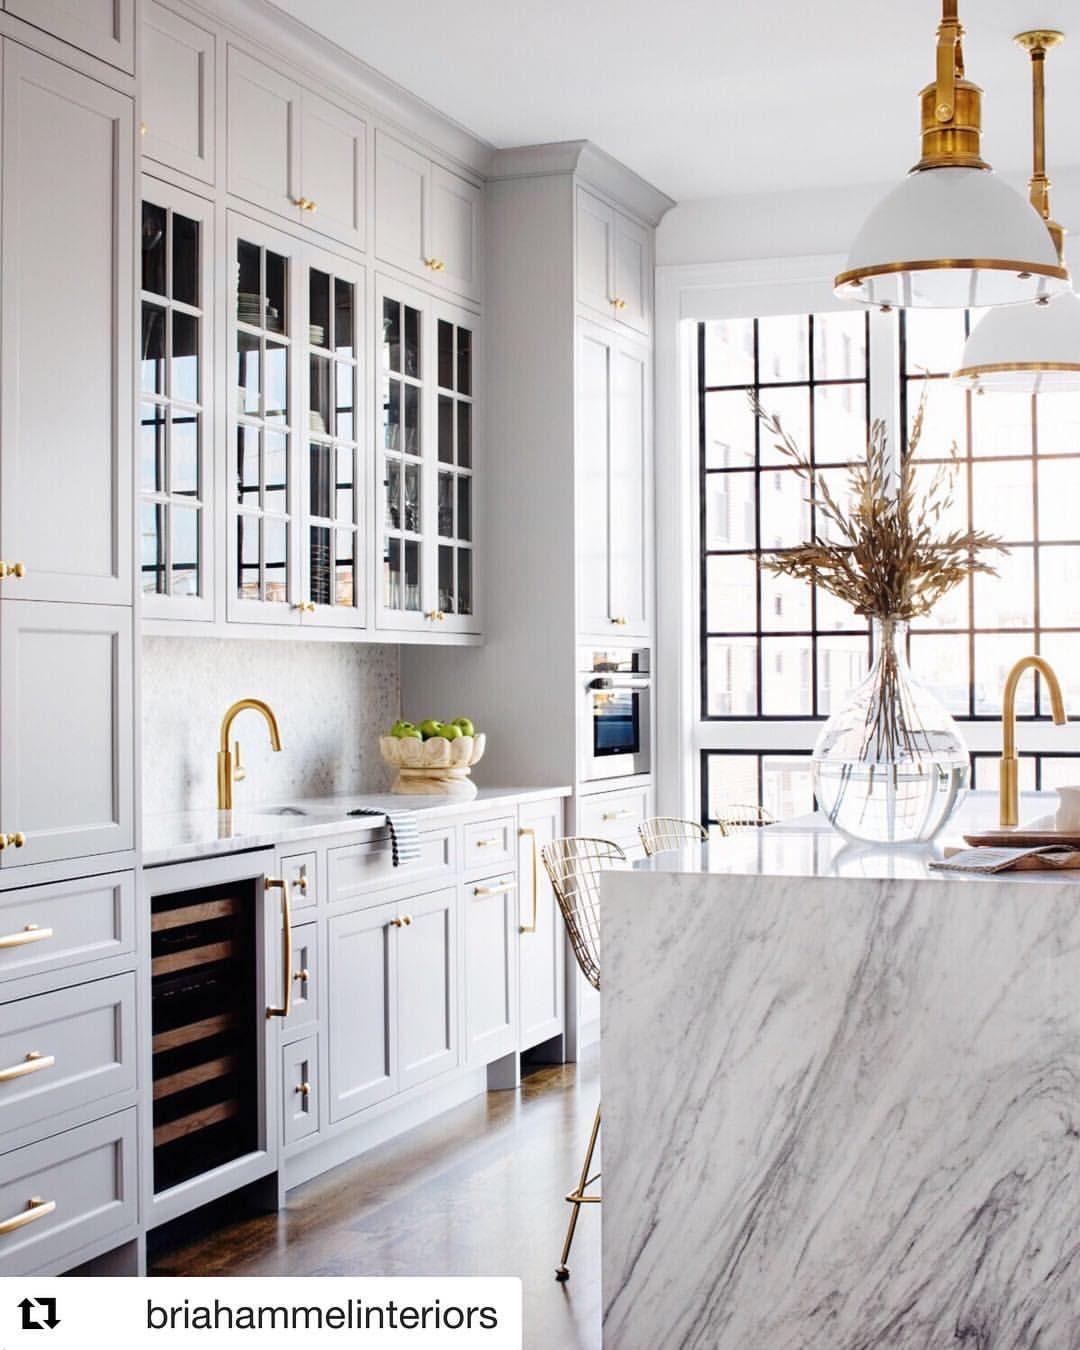 195 Likes 7 Comments Alexandra Friedman Alexandrafriedmanatcompass On Instagram Grey Brass Co White Marble Kitchen Home Kitchens Grey Kitchen Designs